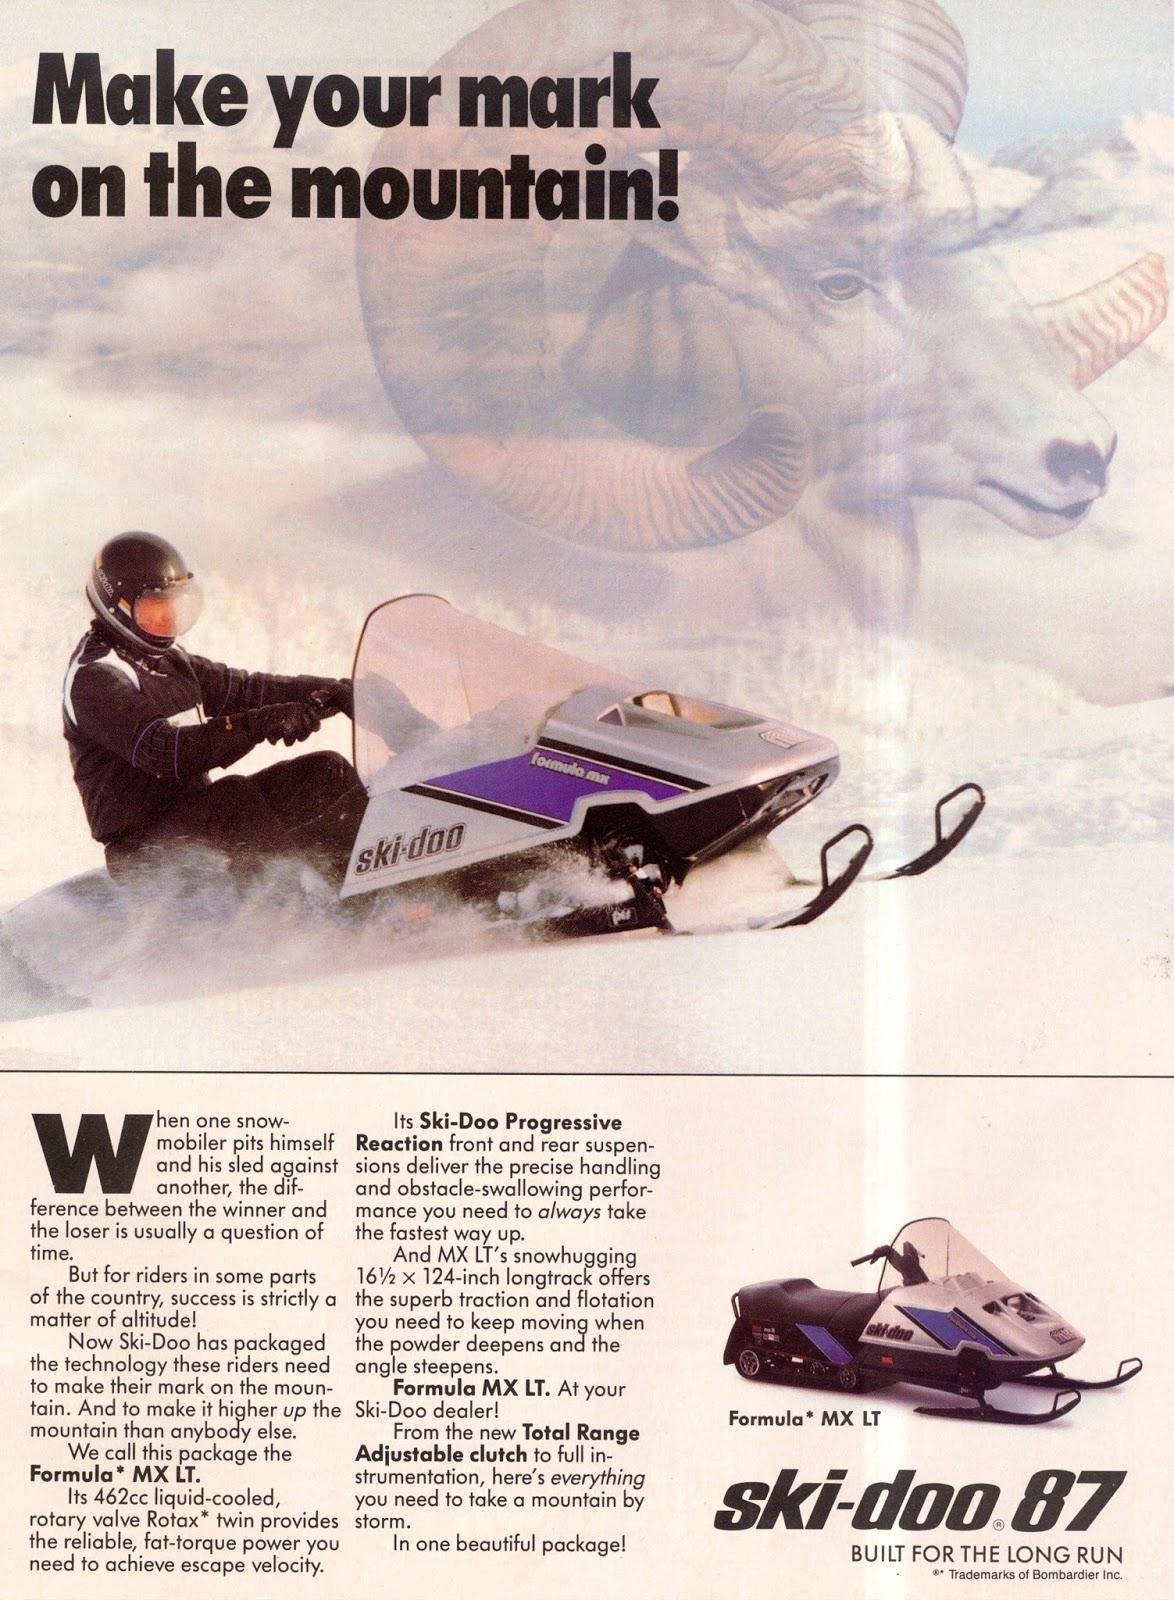 1987 SKI DOO FORMULA MX LT SNOWMOBILE